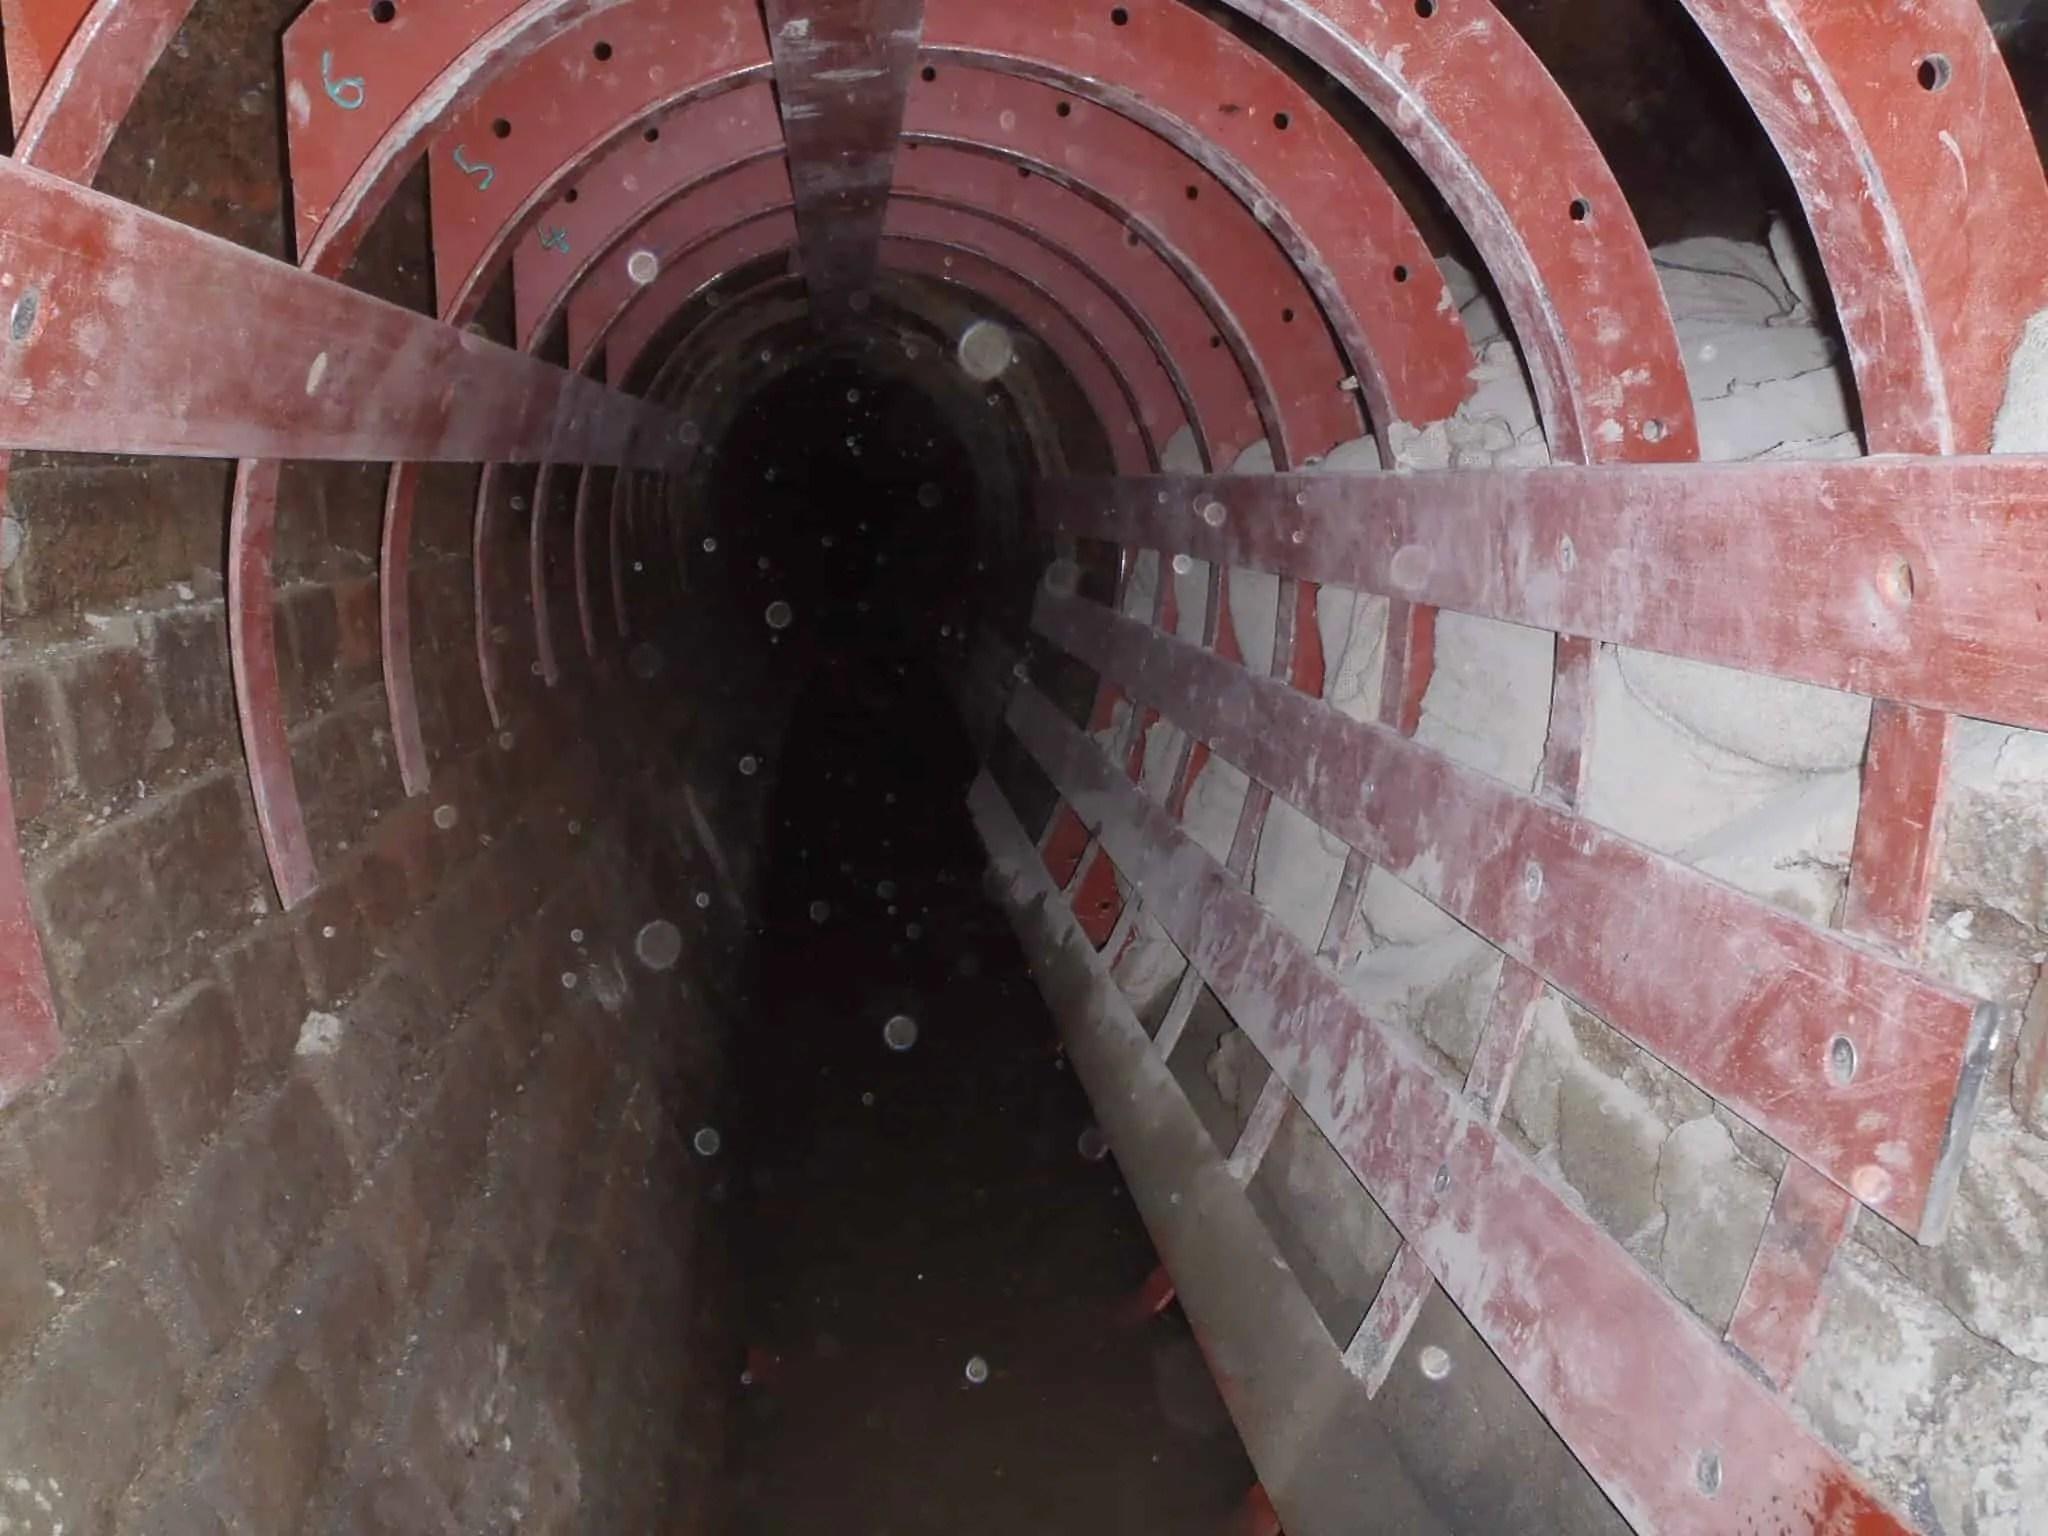 Preparing For Crossrail Groundwork By Protecting A 120m Sewer UKDN Waterflow